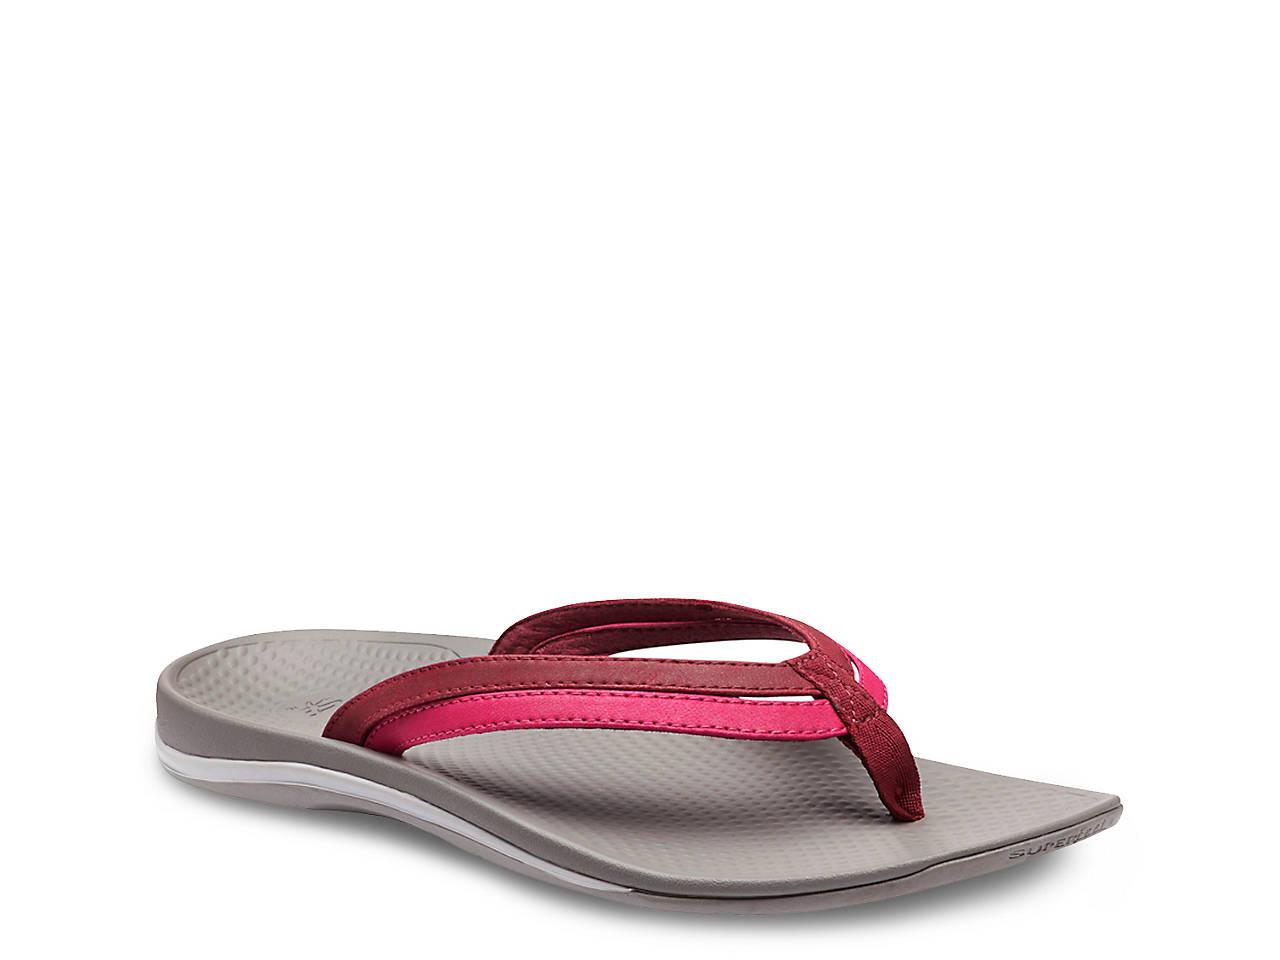 e1d7f2816 Superfeet Rose Sandal Women s Shoes